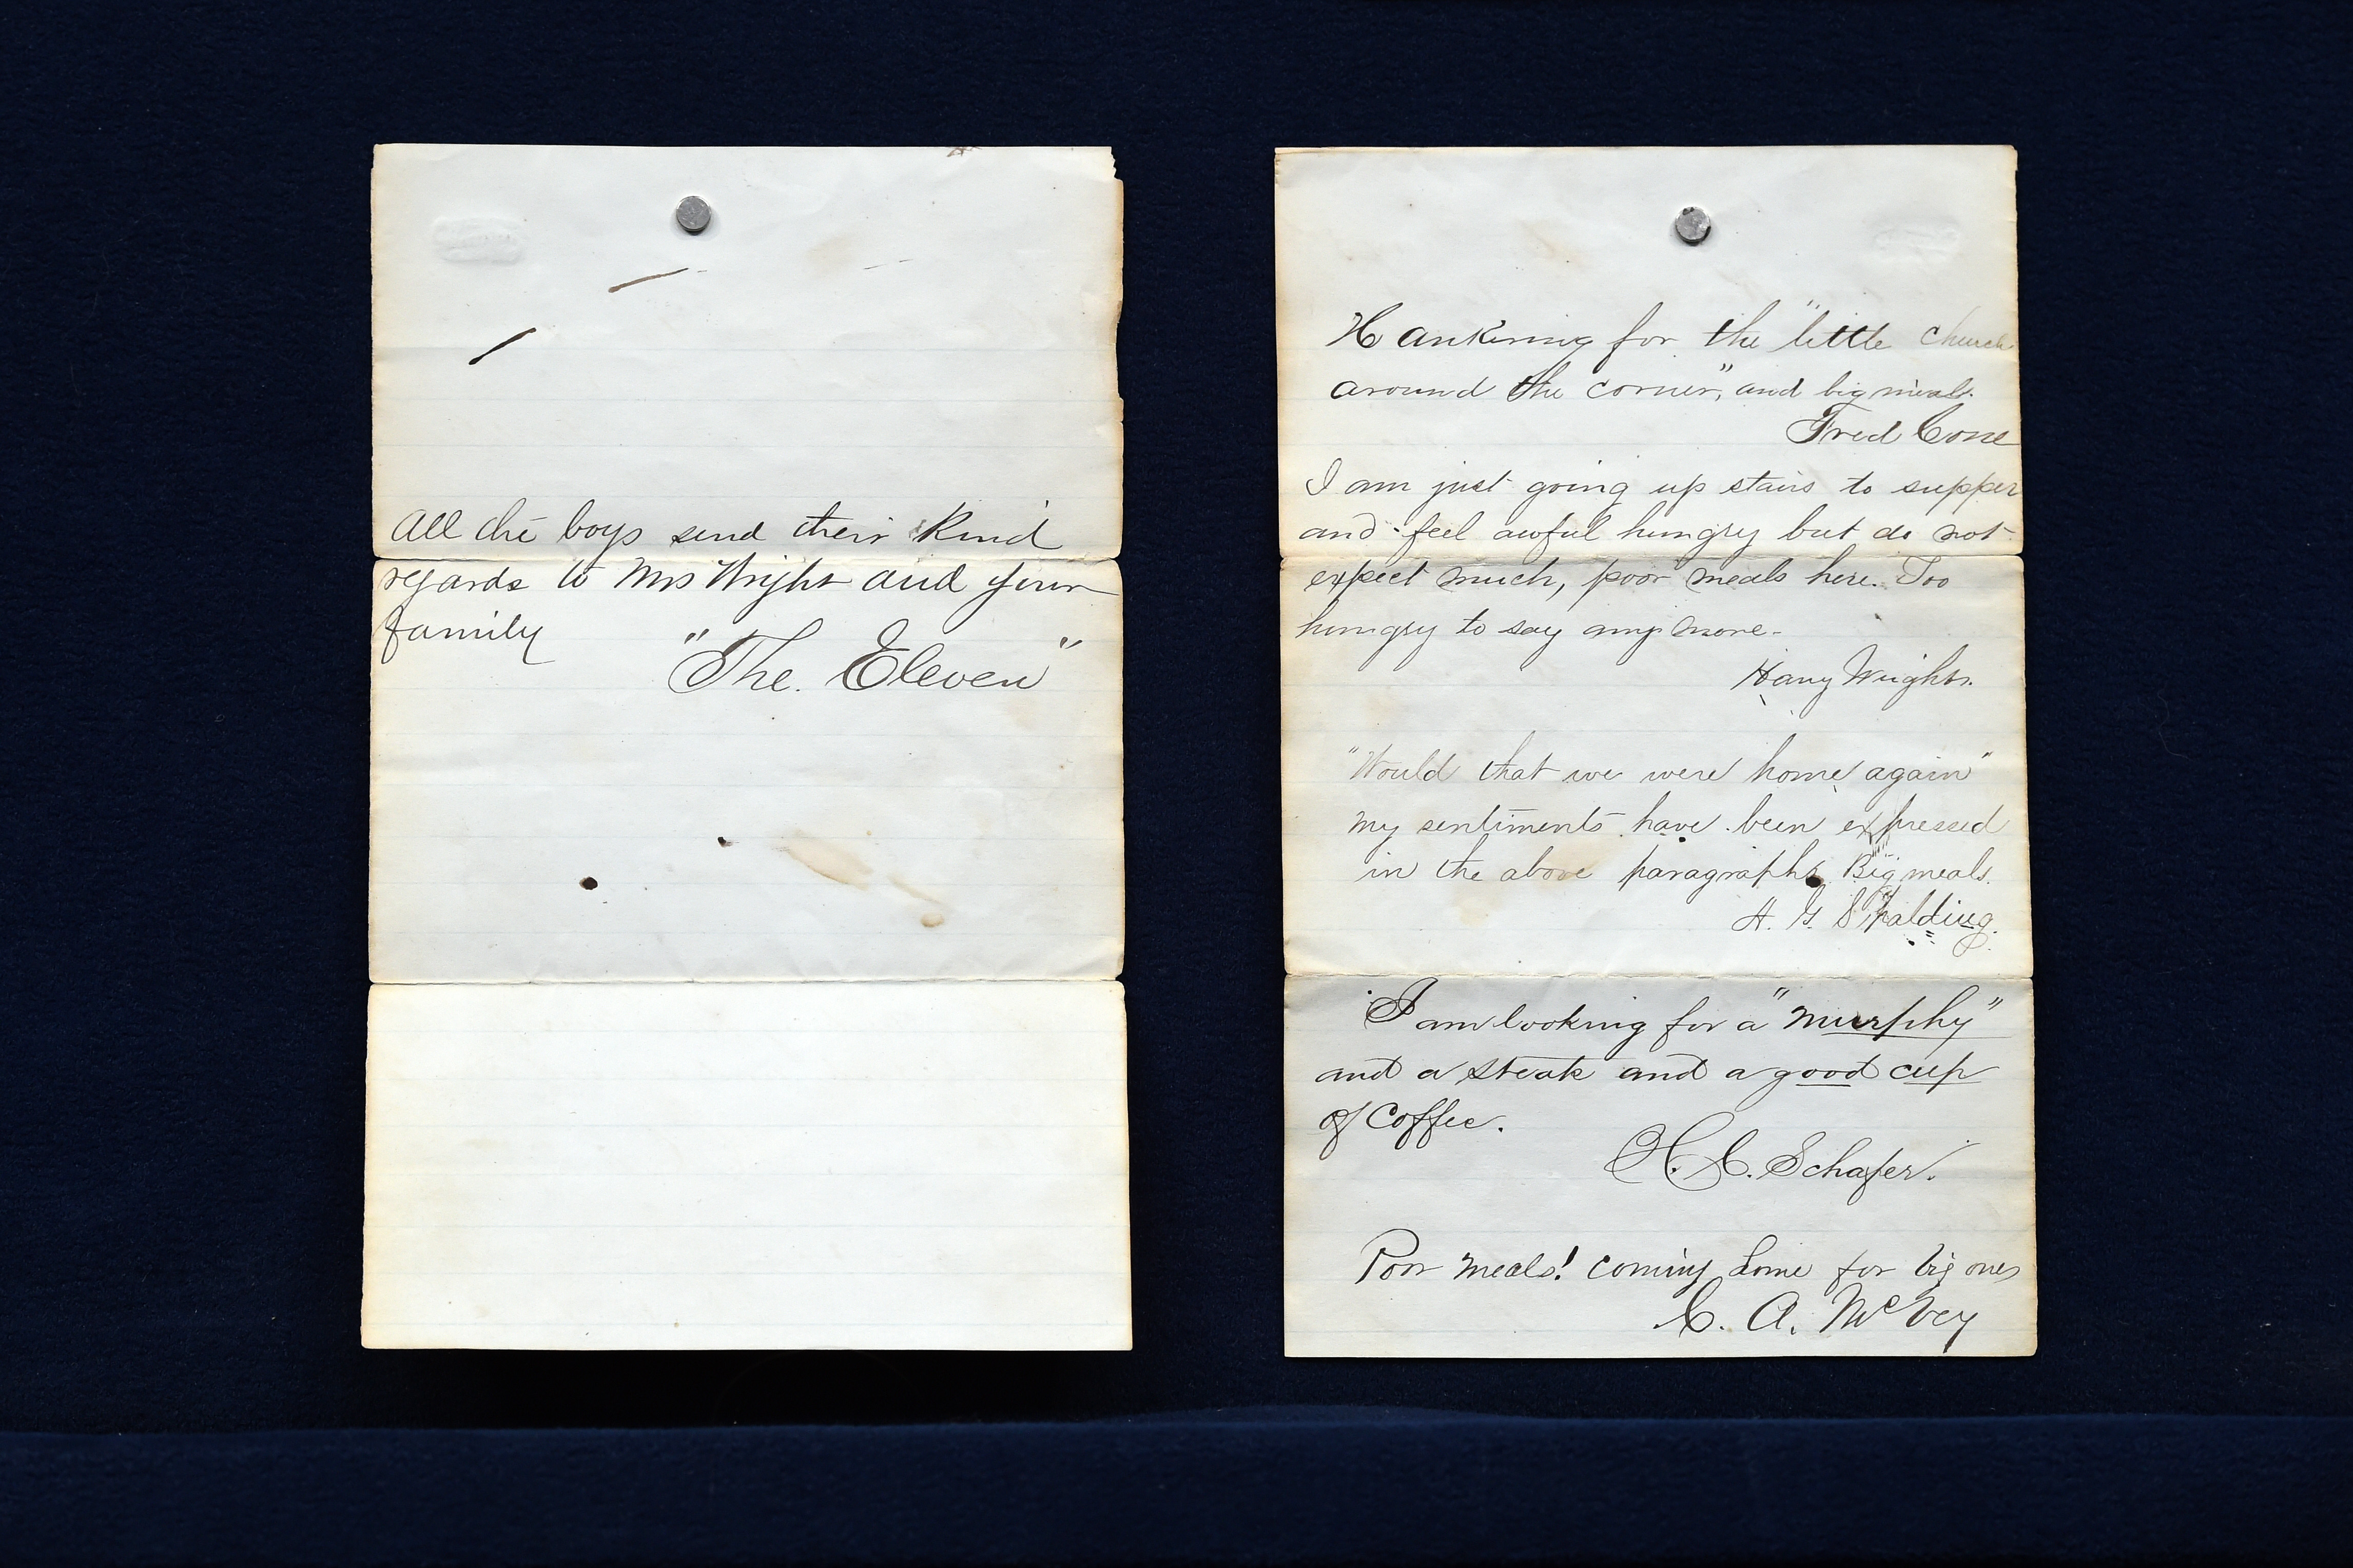 1870s Boston Red Stockings letter